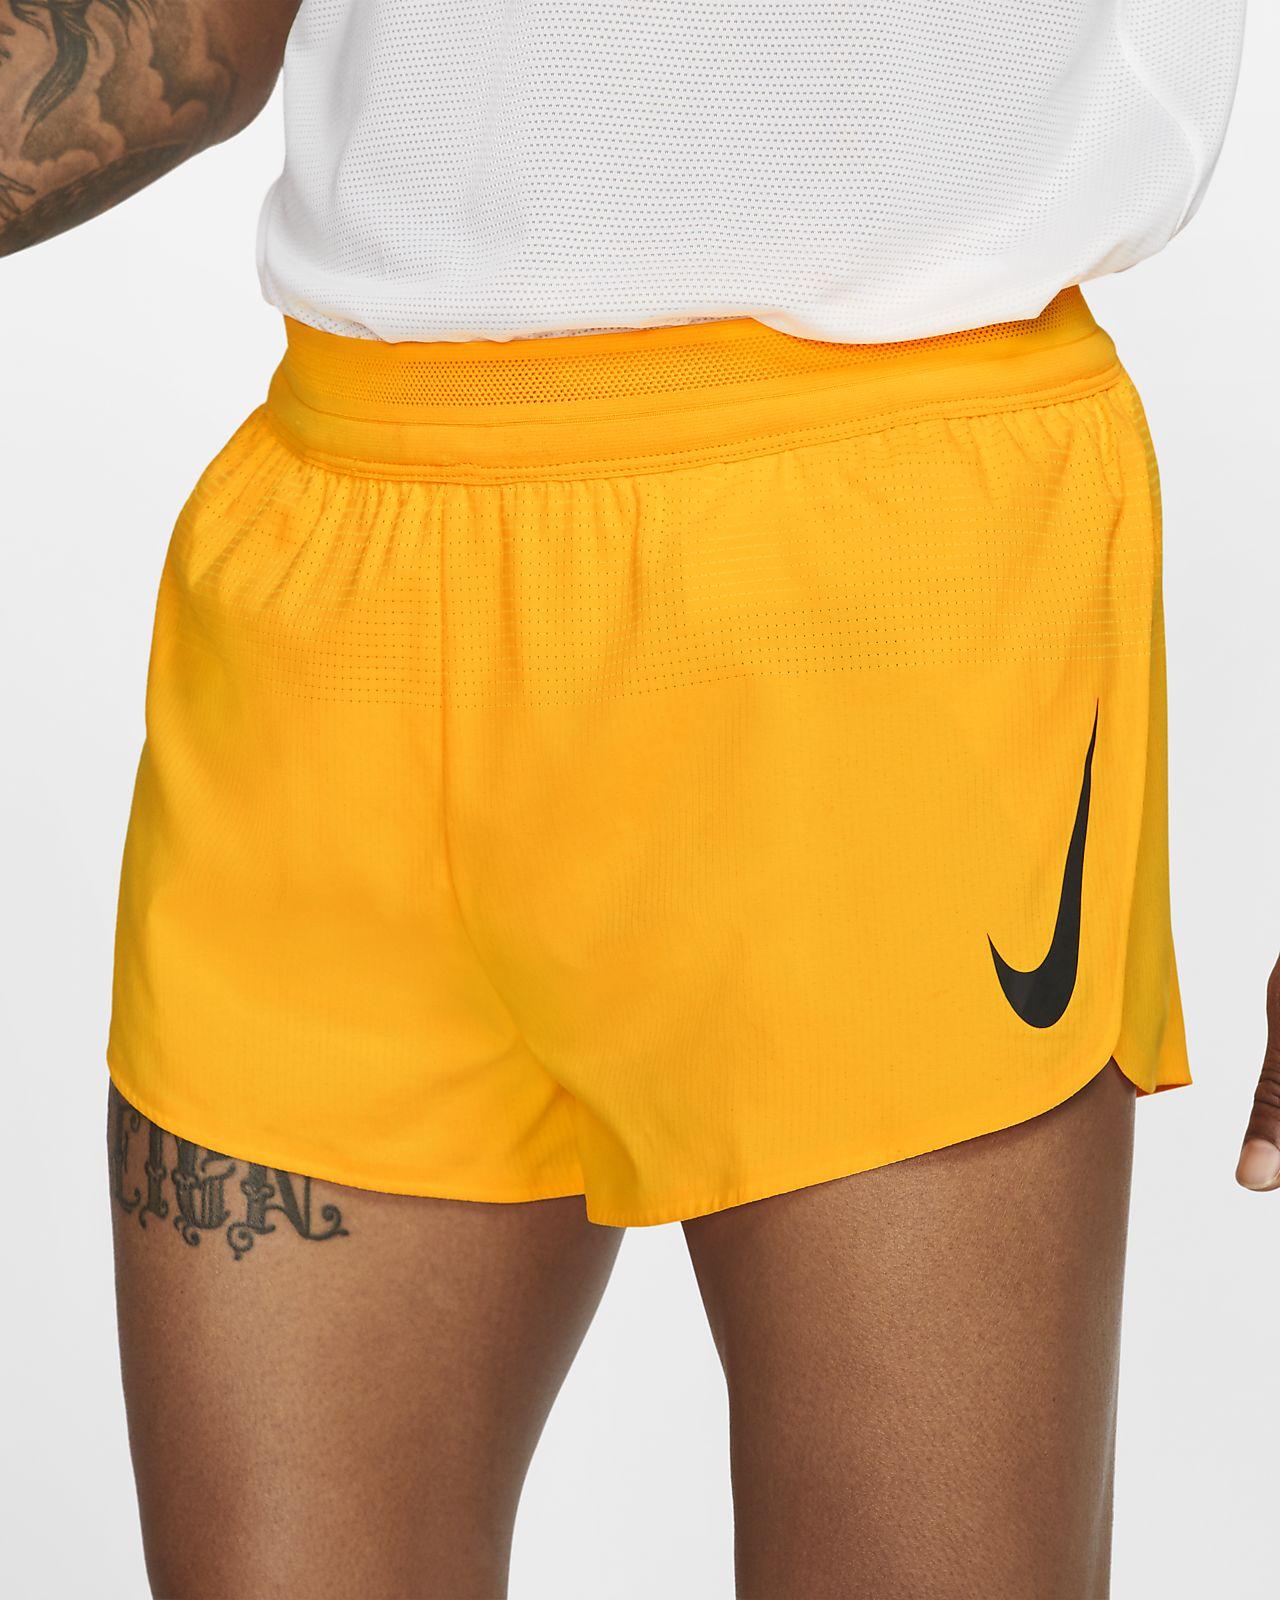 Nike AeroSwift (London) Hardloopshorts van 5 cm voor heren